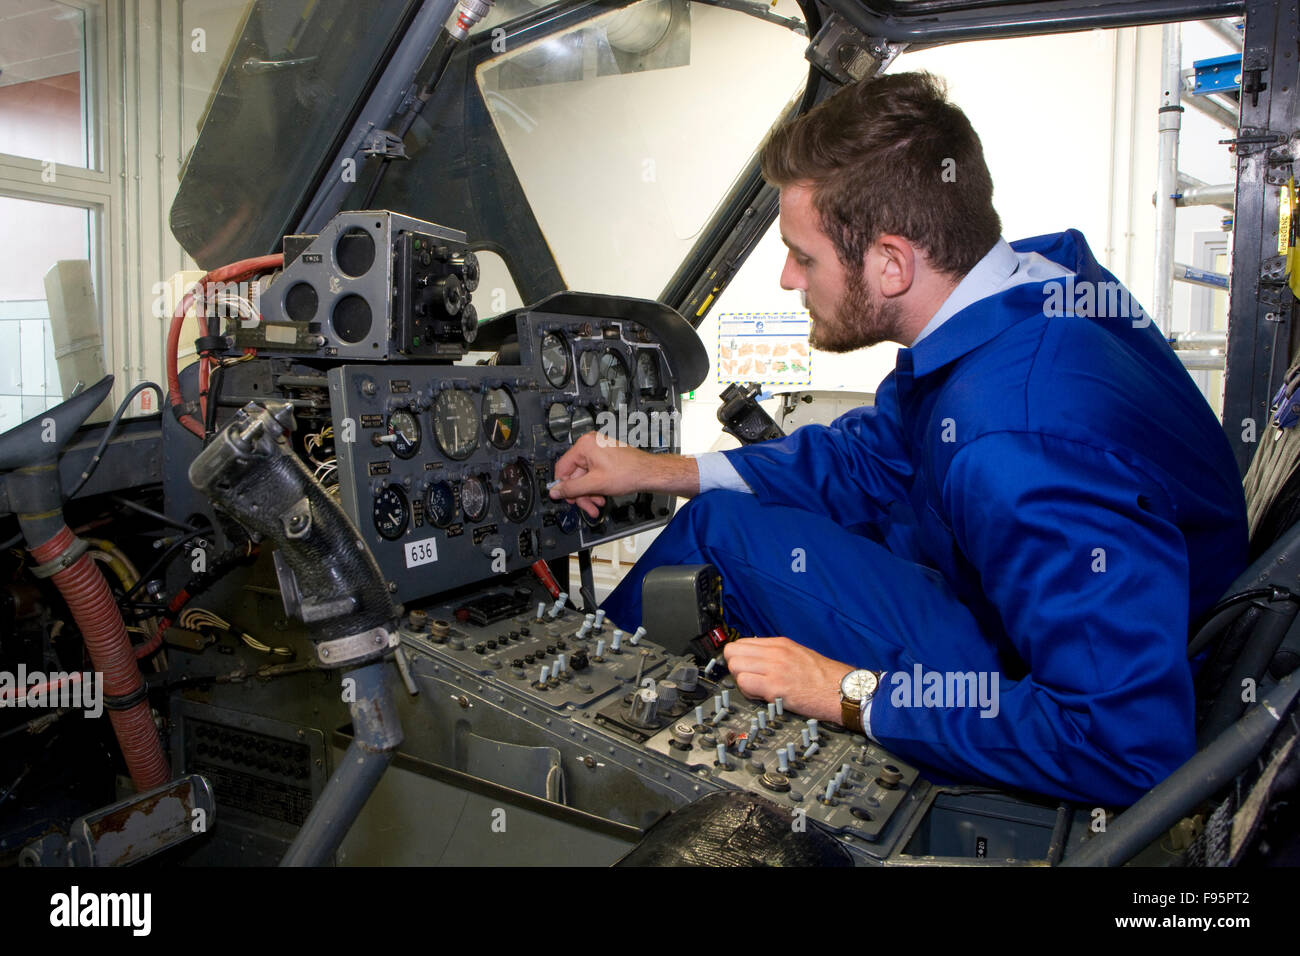 Aviation apprentice engineer - Stock Image